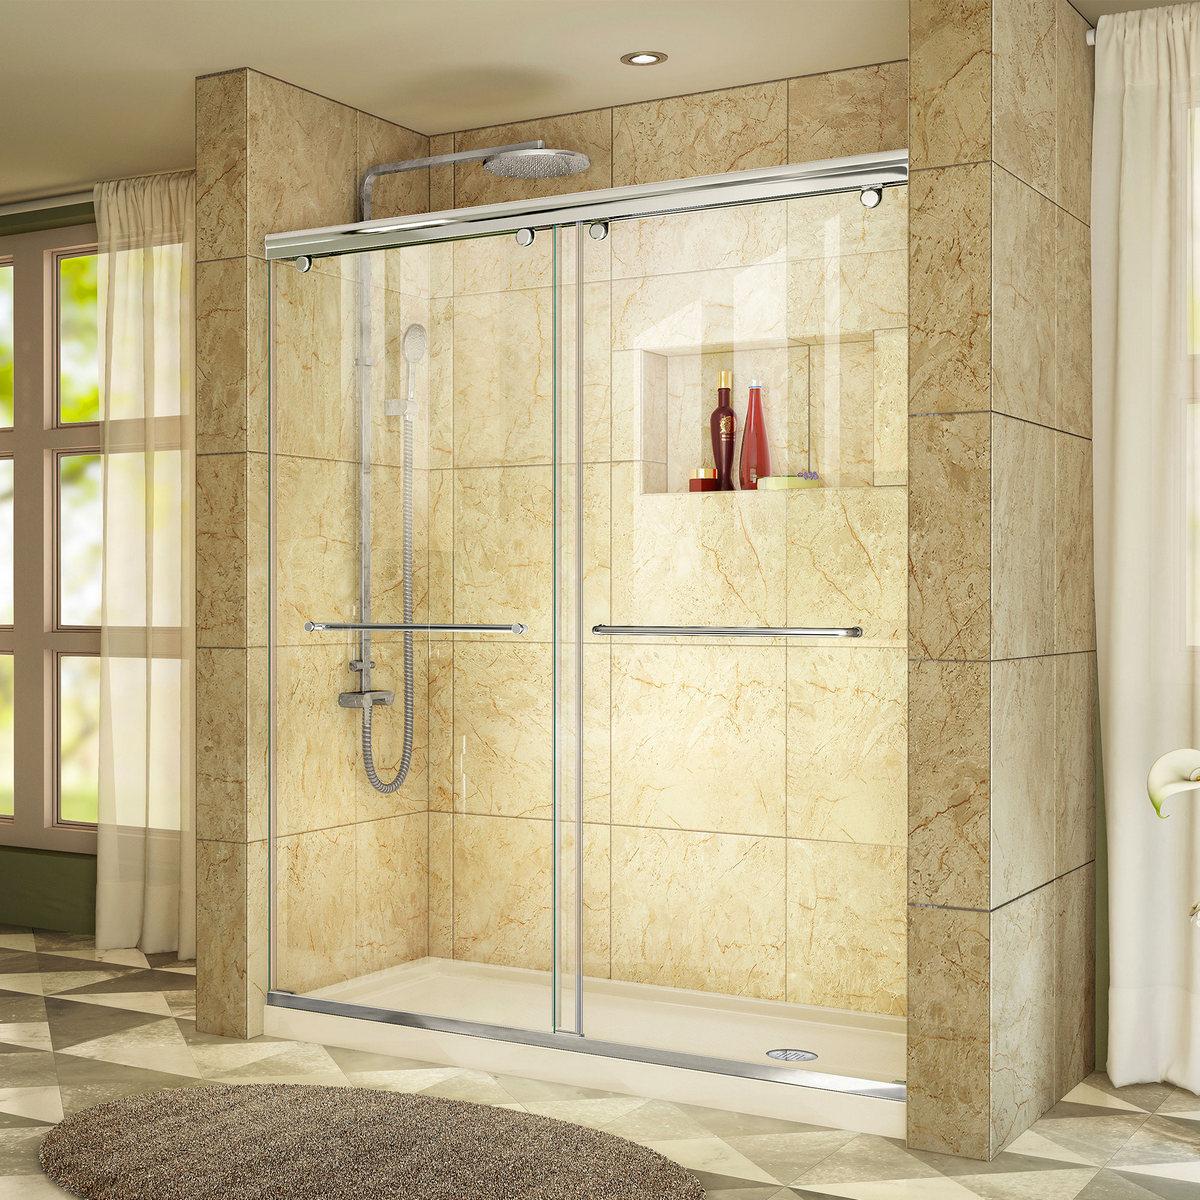 Dreamline Shower Door Chrome Right Drain Biscuit Base Kit